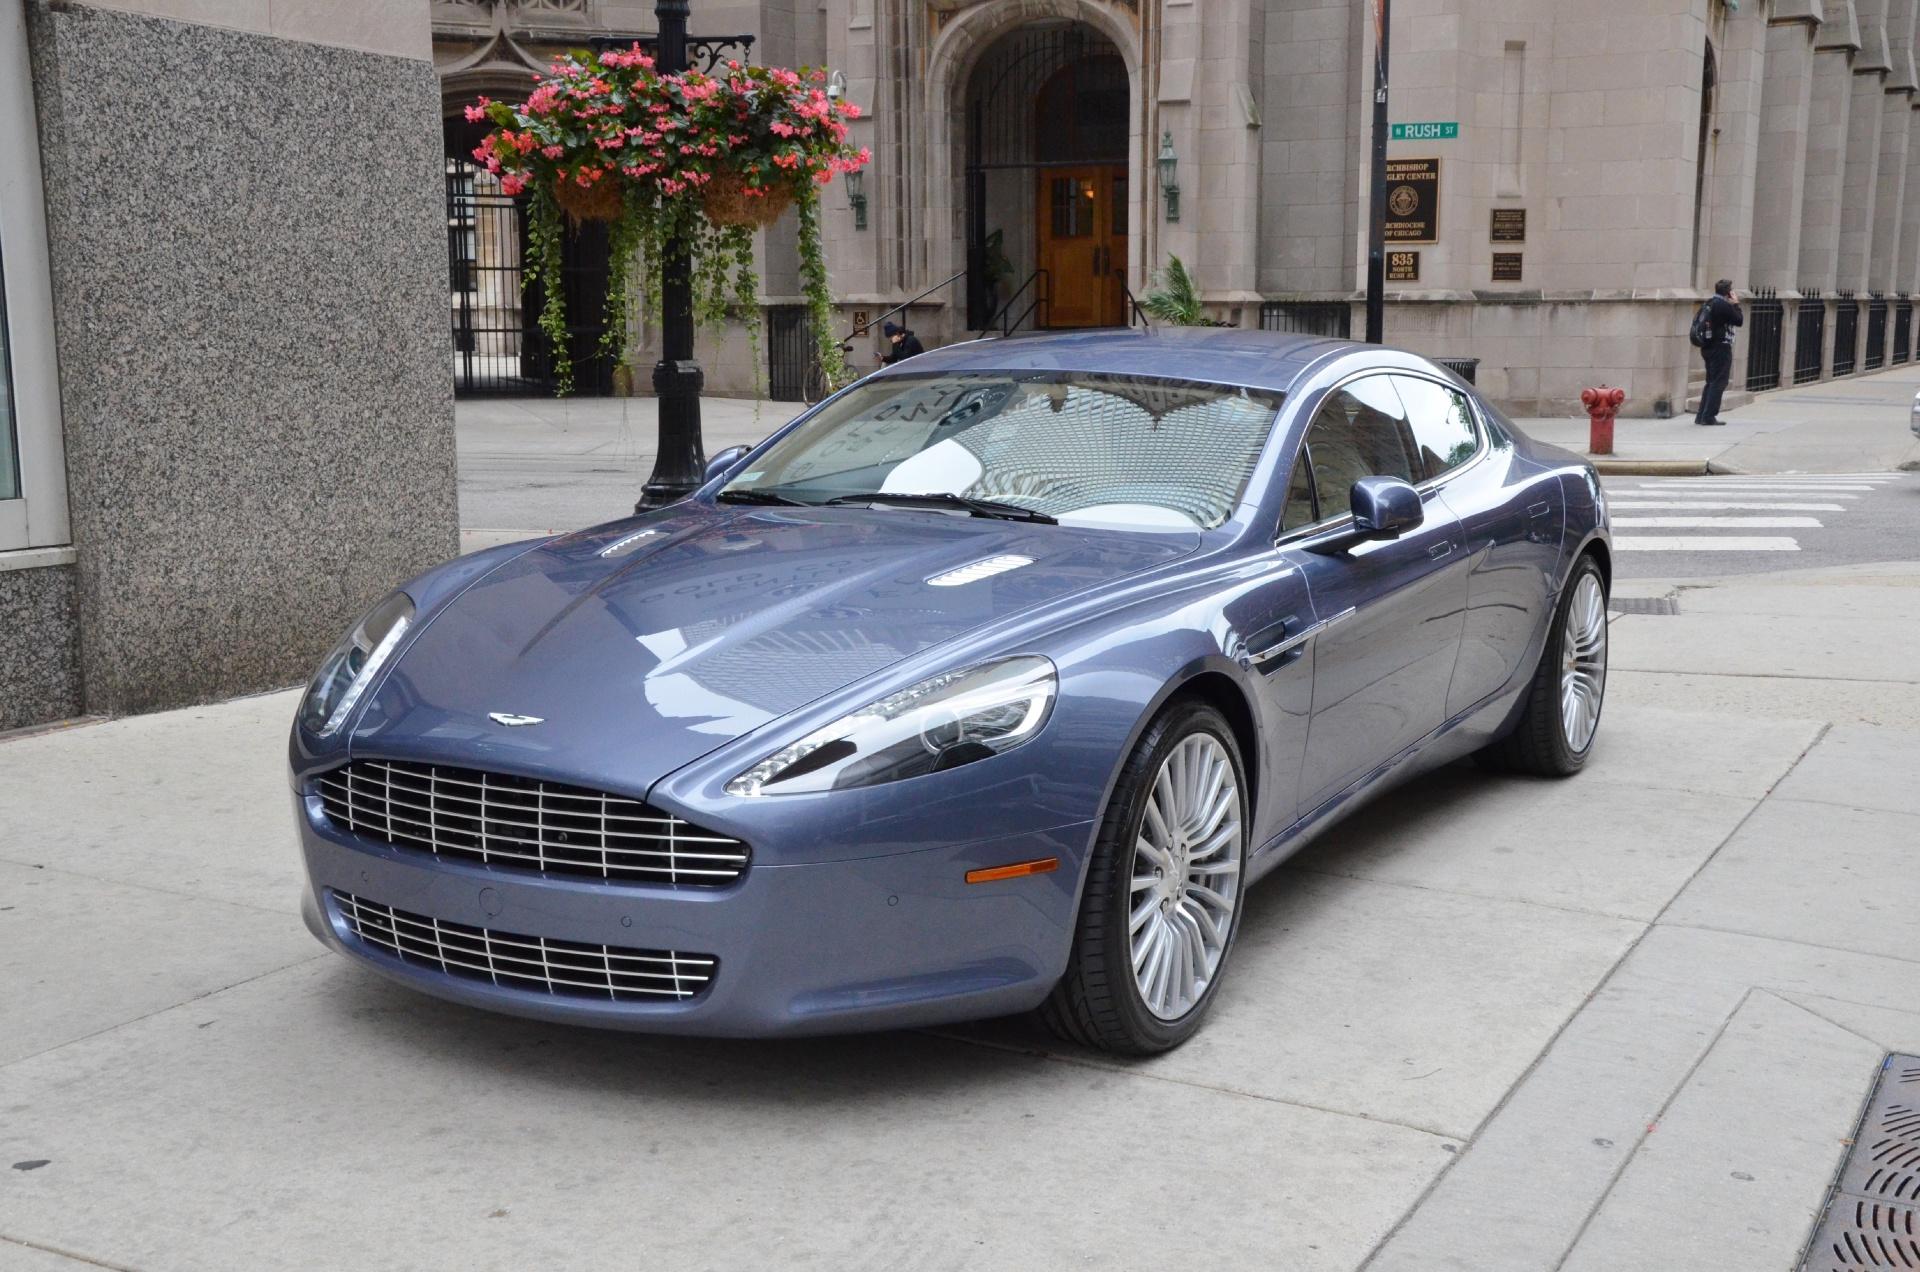 2011 Aston Martin Rapide Stock B599a For Sale Near